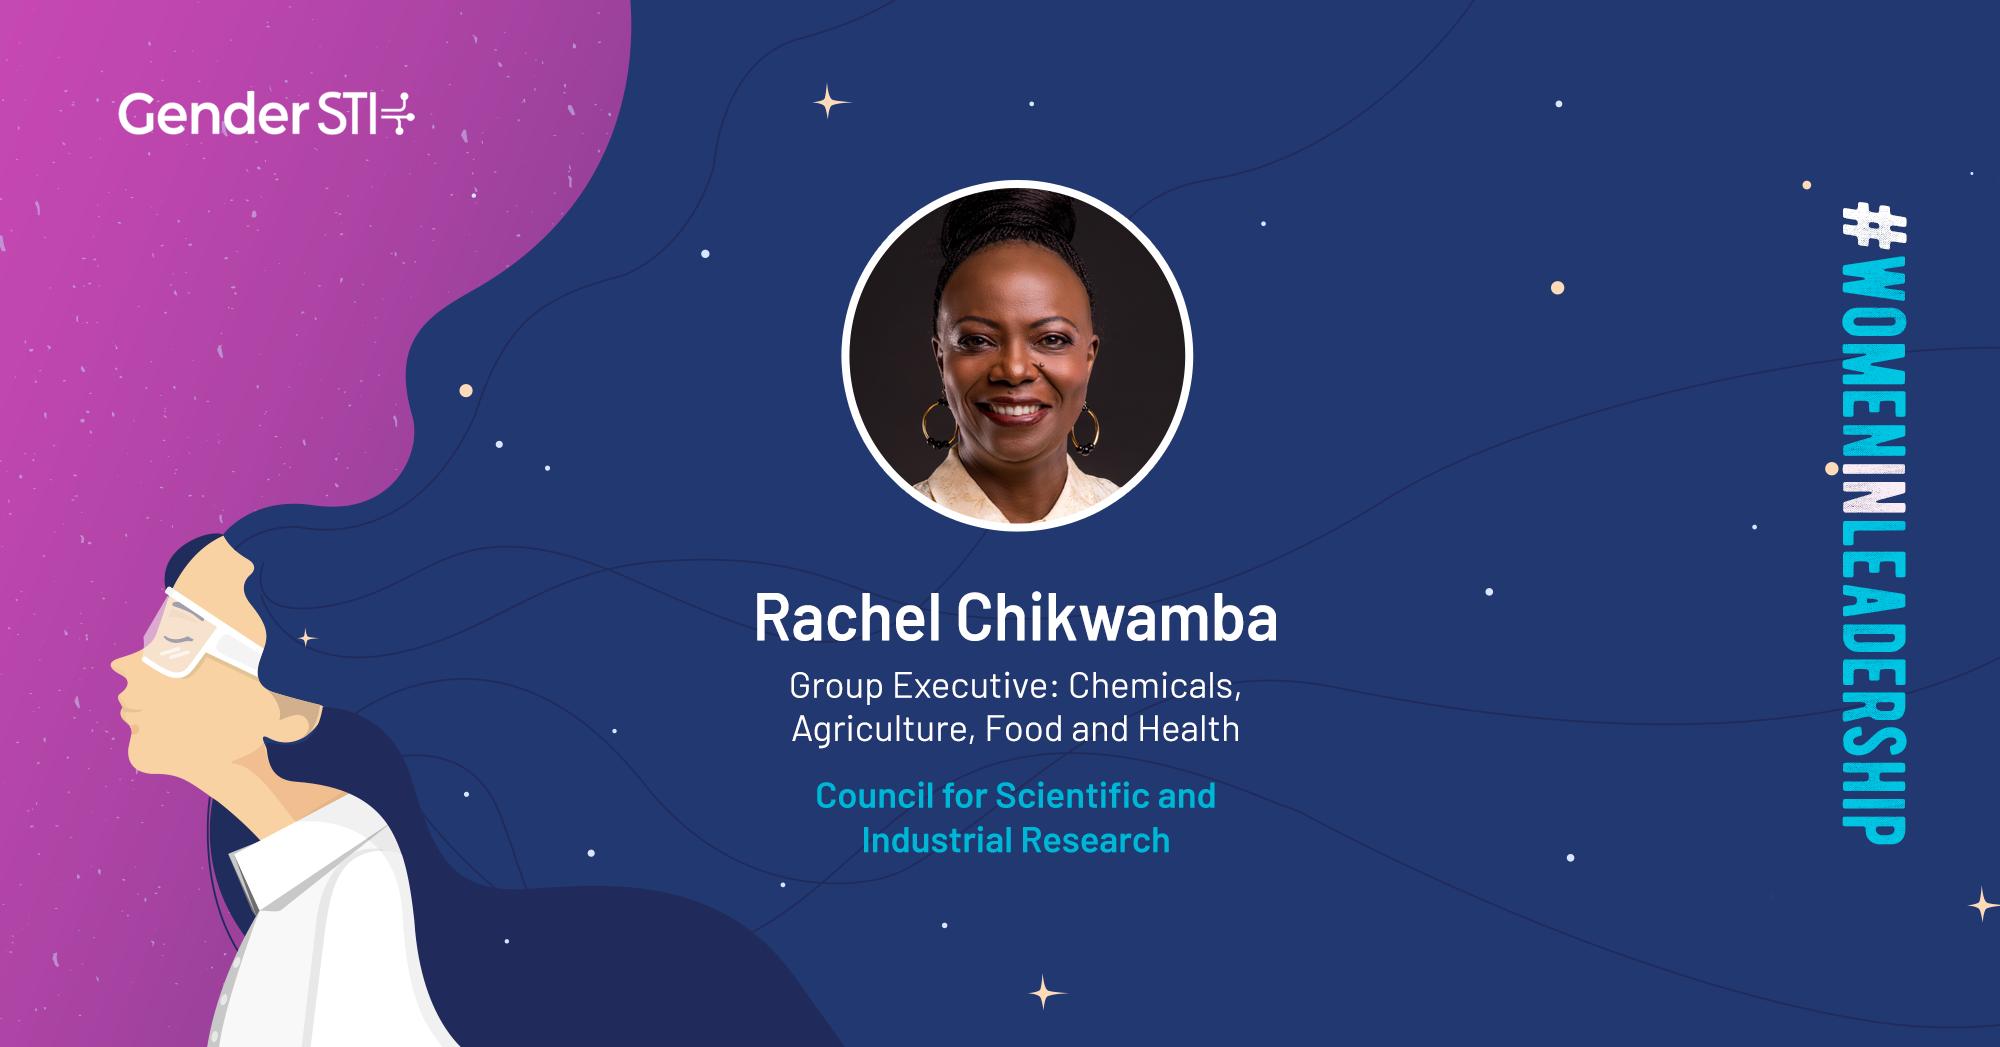 Rachel Chikwamba, CSIR Group Executive, is one of Gender STI's #WomenInLeadership nominees.